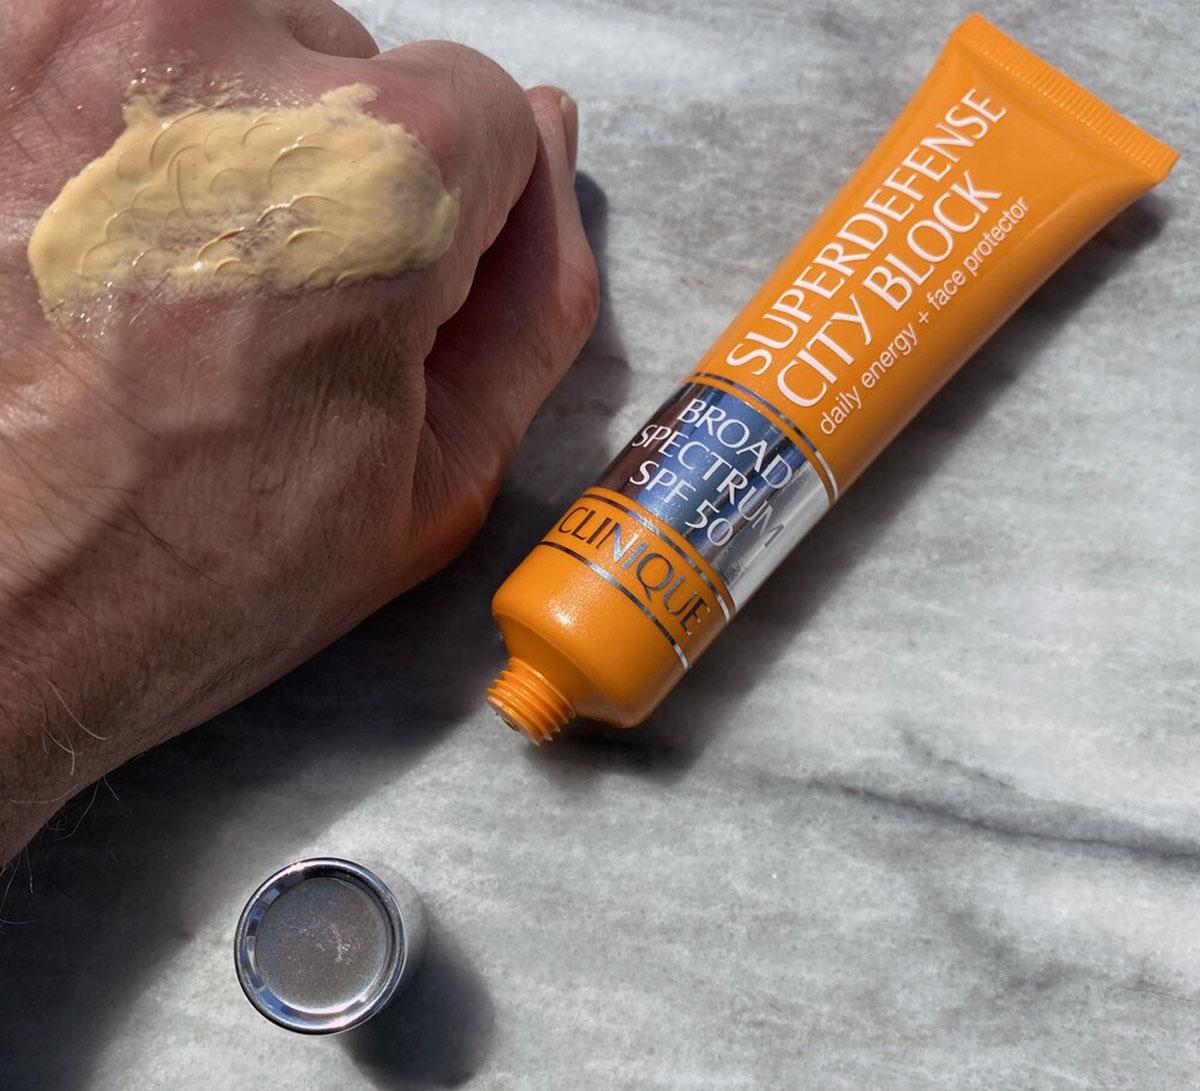 ضد آفتاب چند کاره SPF 50 کلینیک